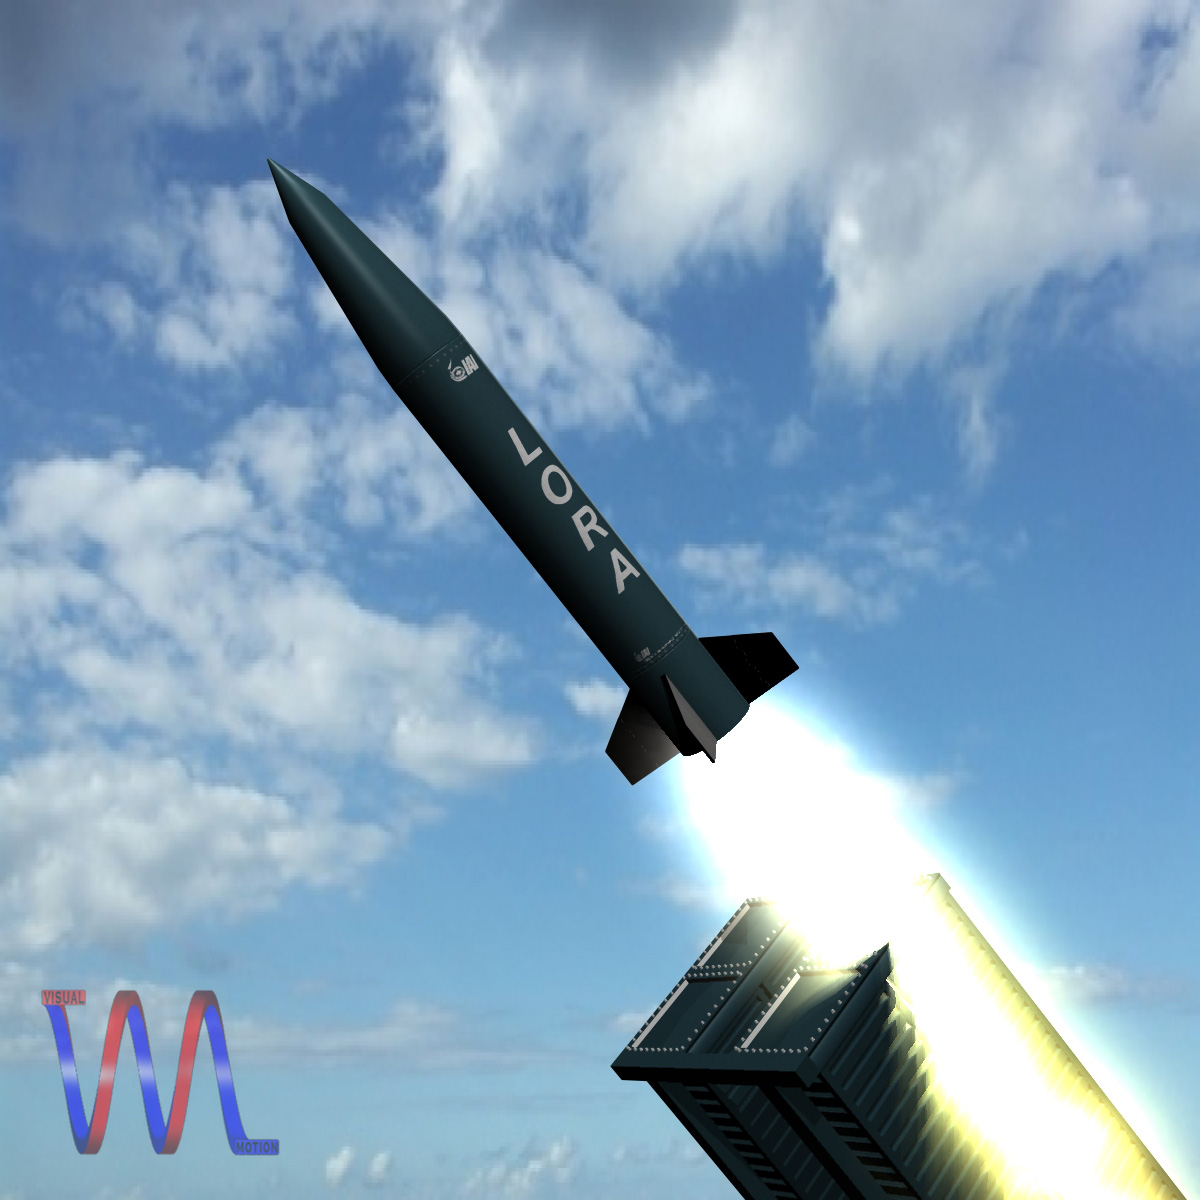 Lora Missile 3d model 3ds dxf fbx blend cob dae x obj 217676